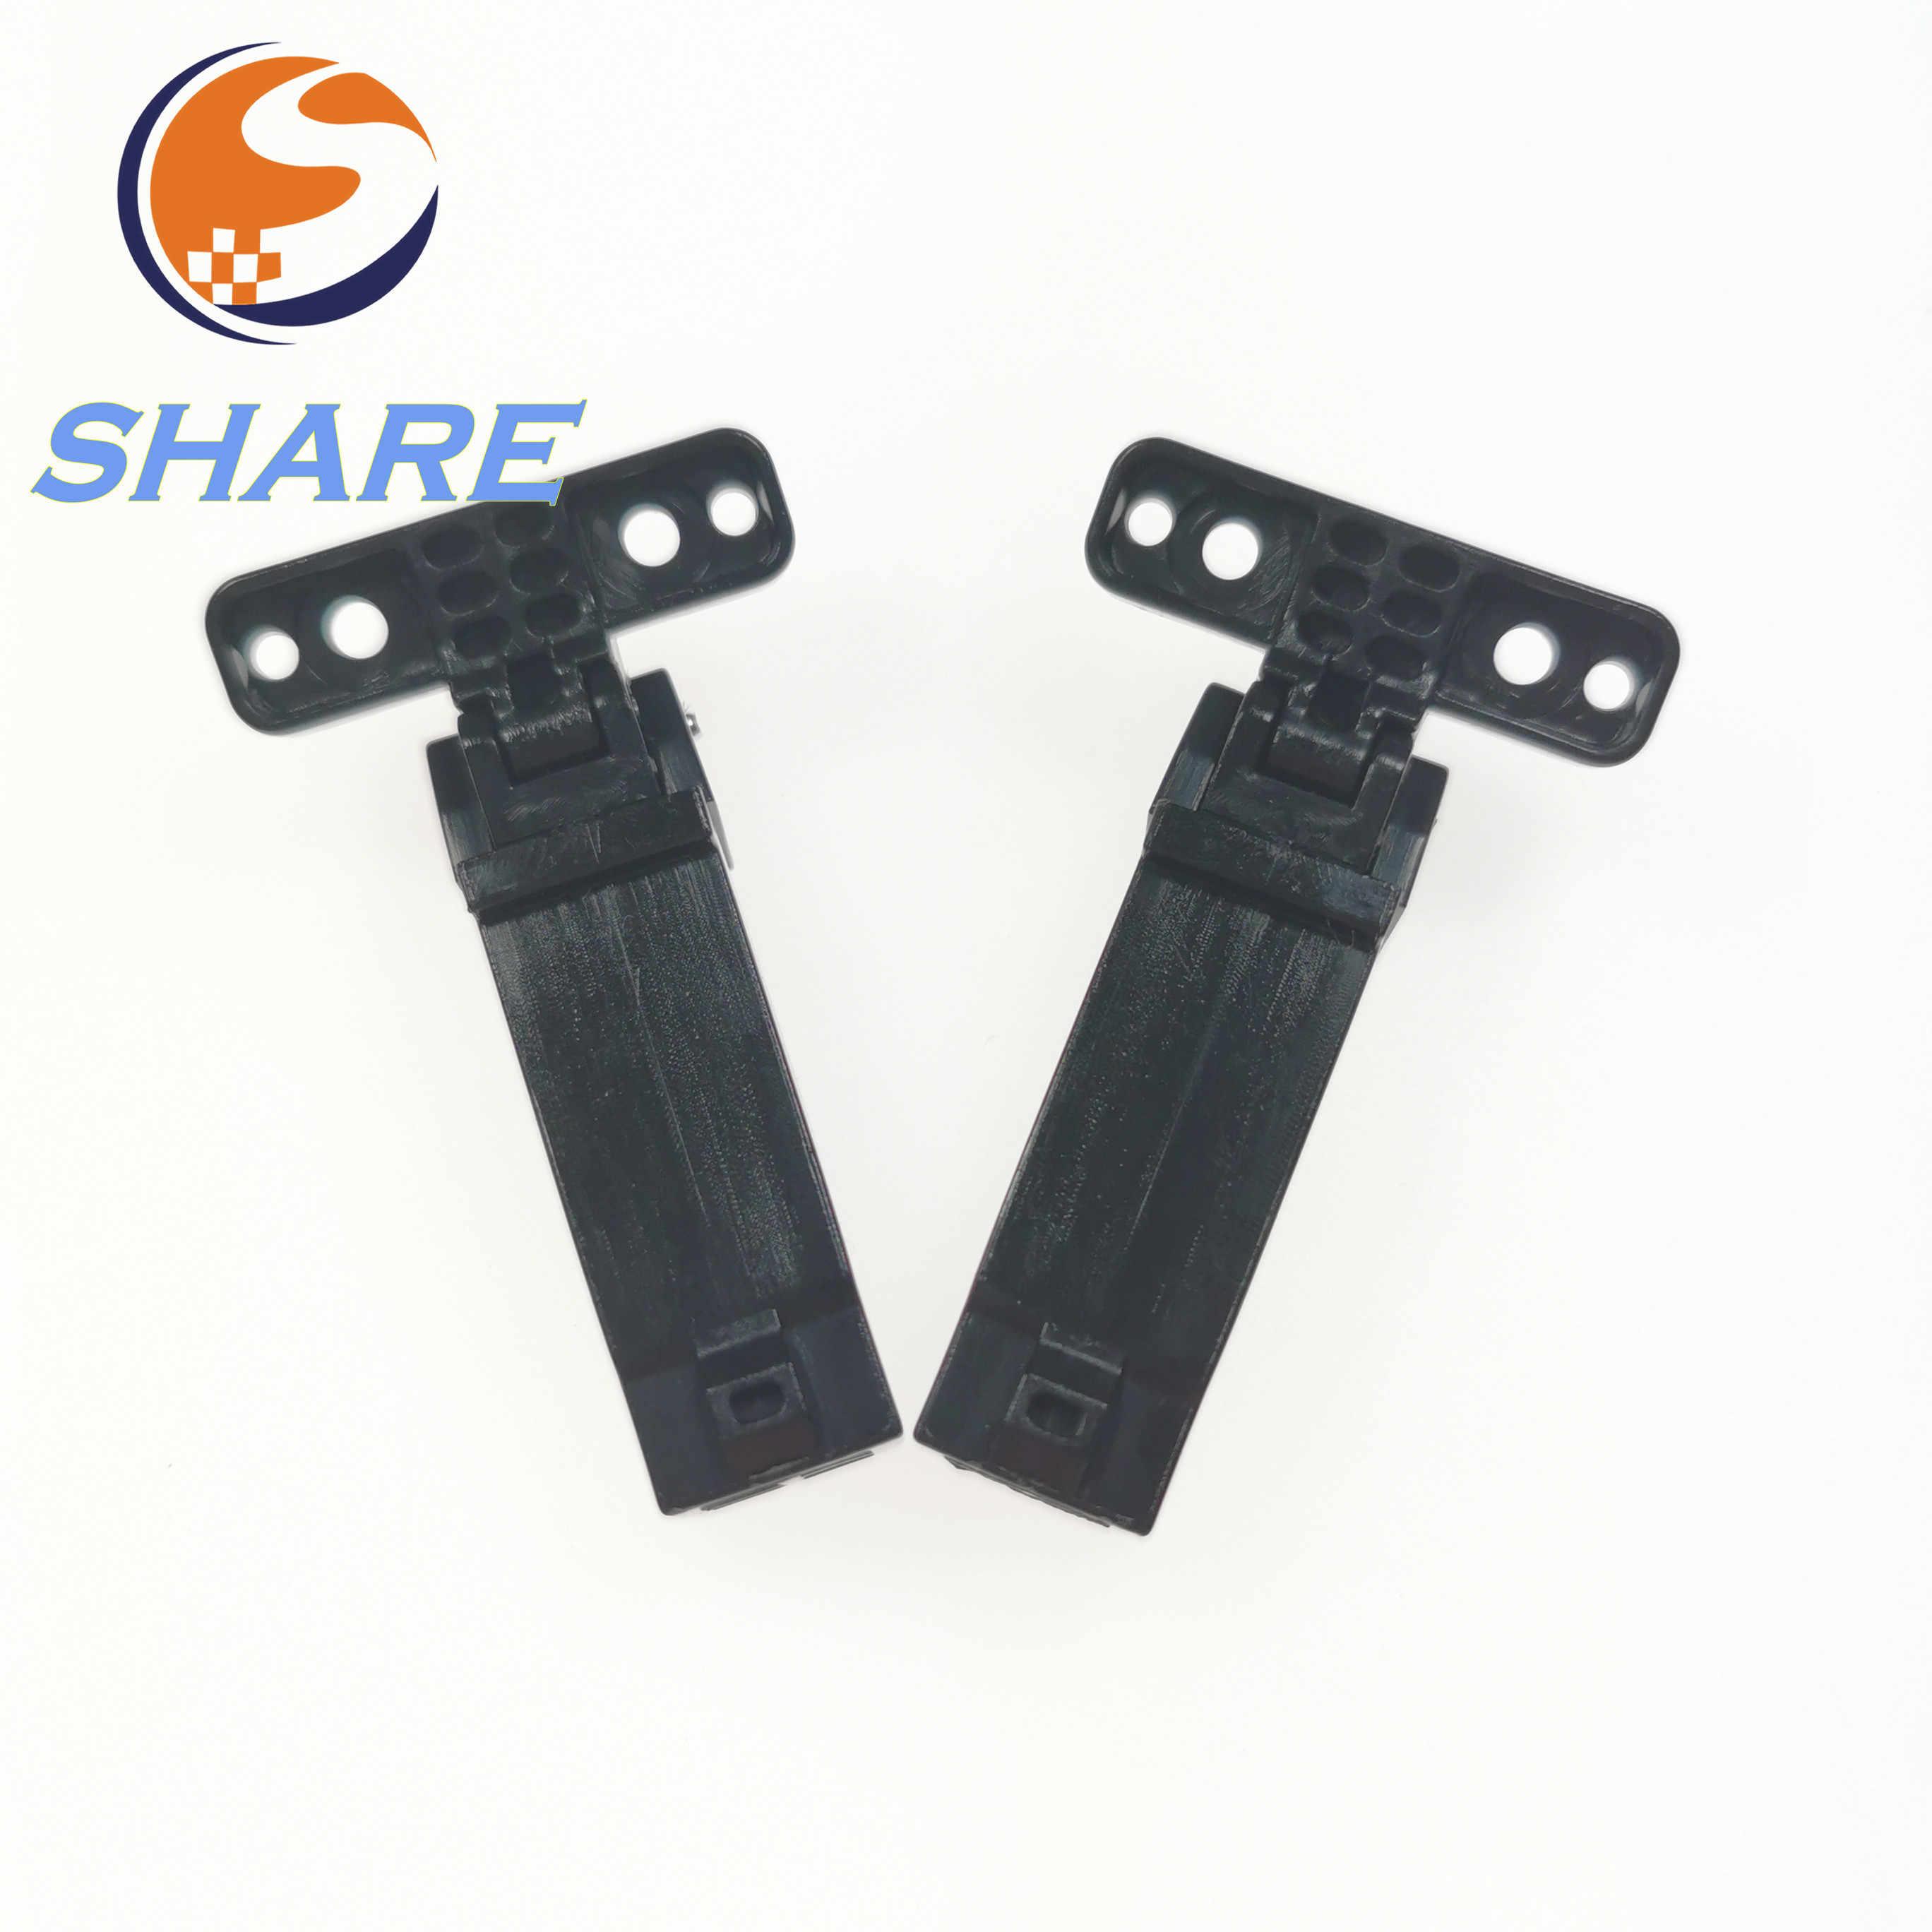 Bagikan PS ADF Mea Unit Engsel Perakitan Digunakan untuk Samsung CLX3170 3175 3185 4175 3305 6260 SCX3400 3401 3405 3406 4600 4601 4623